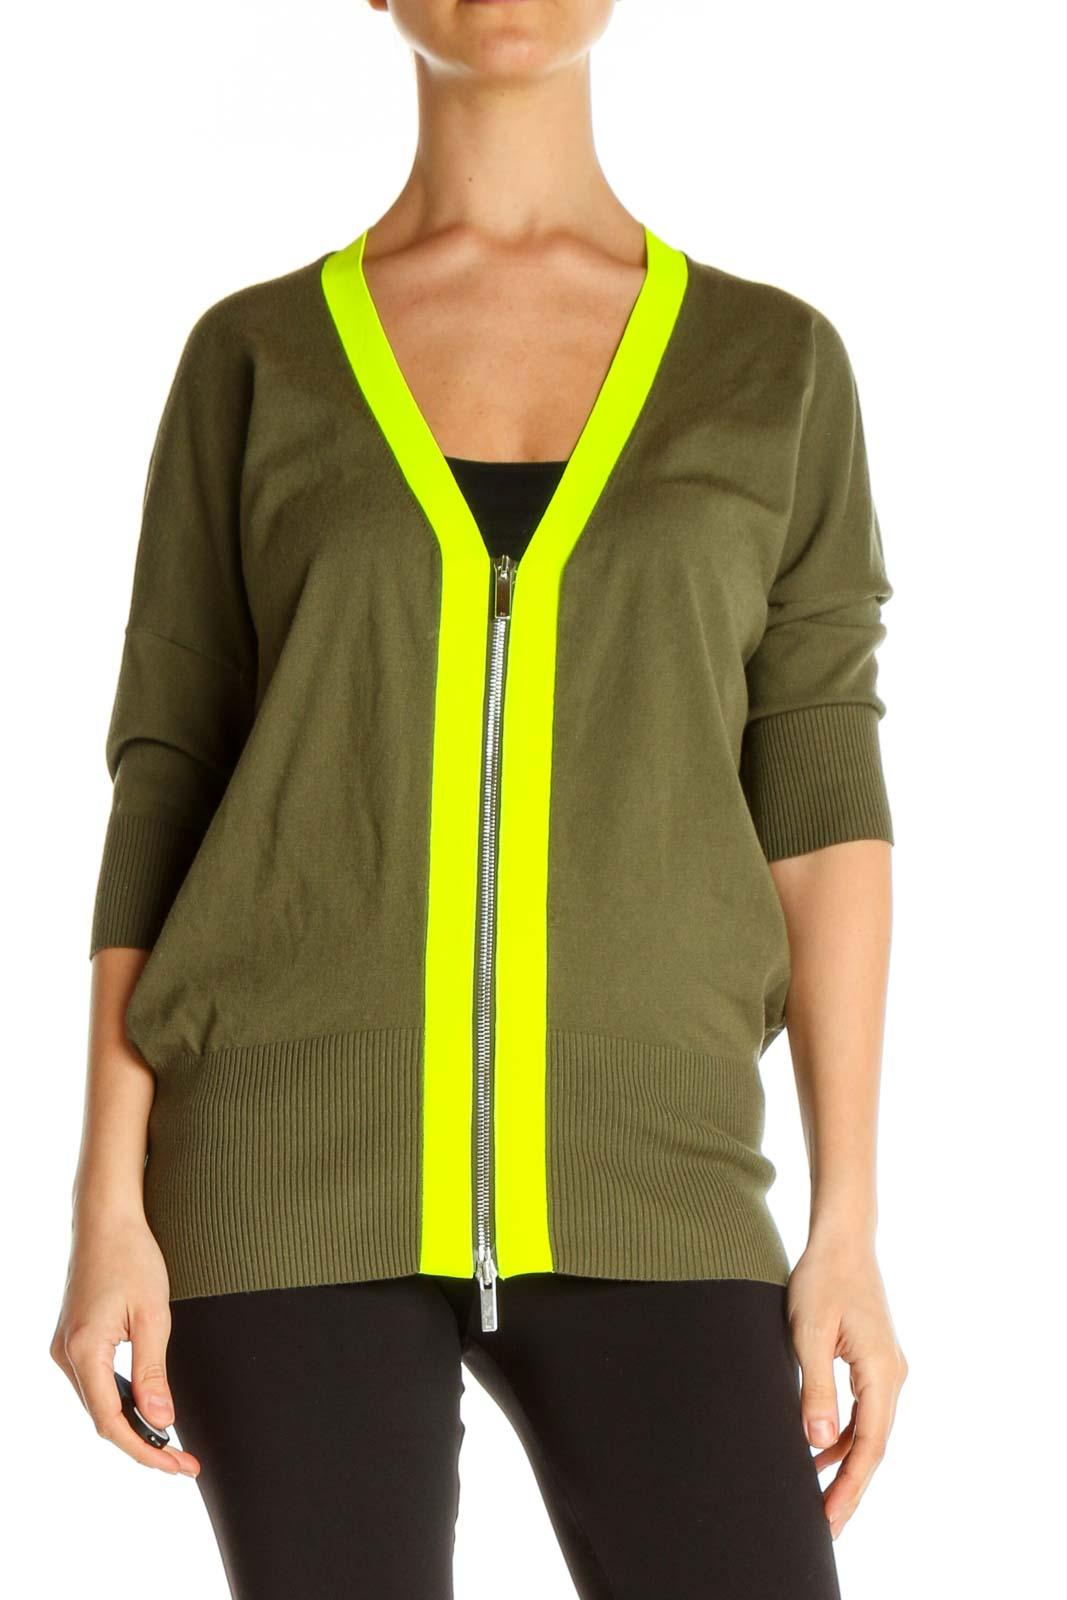 Green Colorblock Cardigan Front